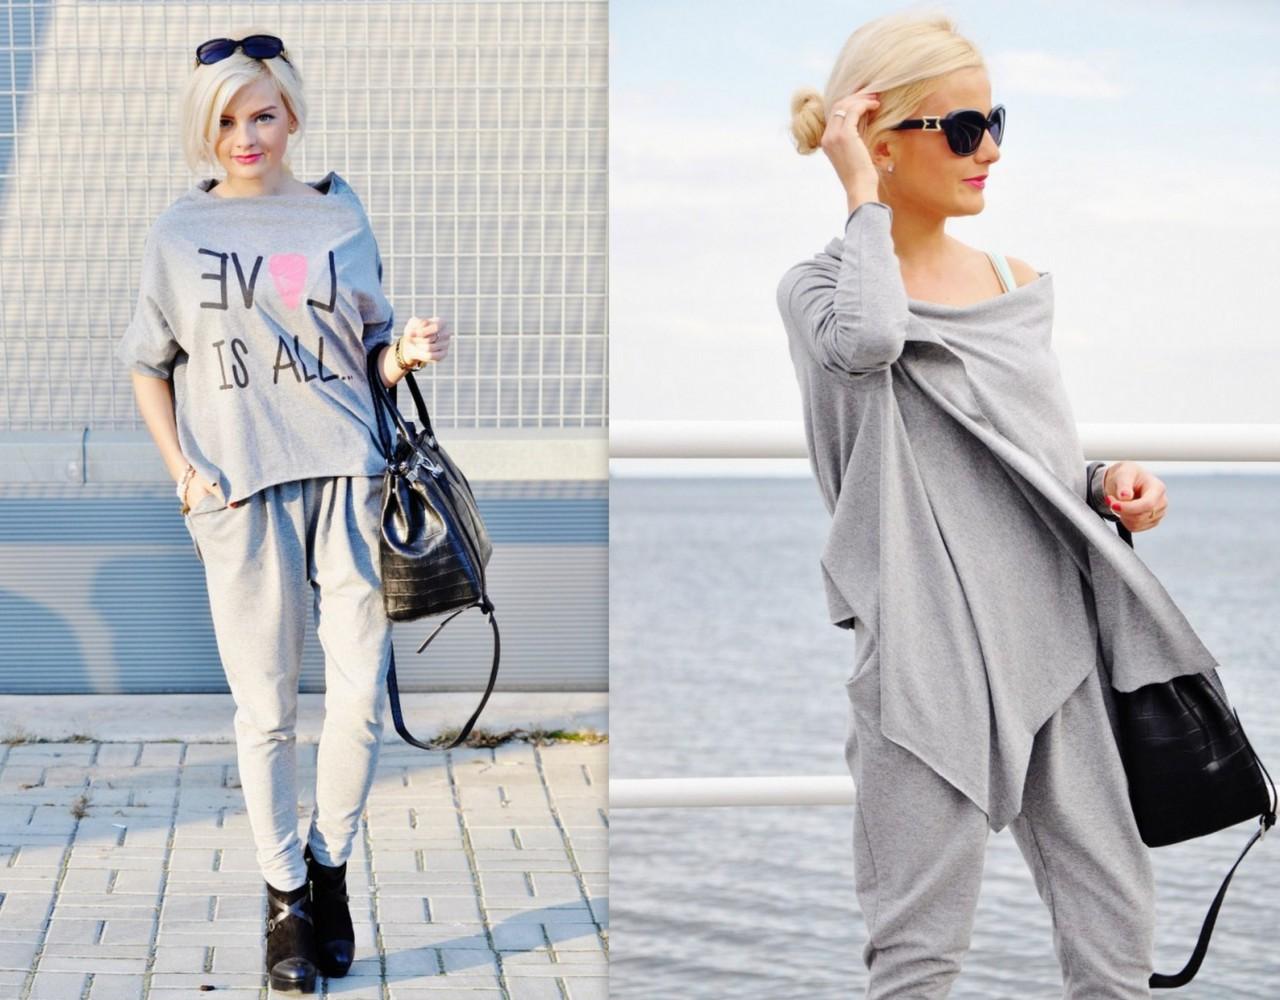 by insomnia spodnie szare lala pants blog moda blog lifestyle